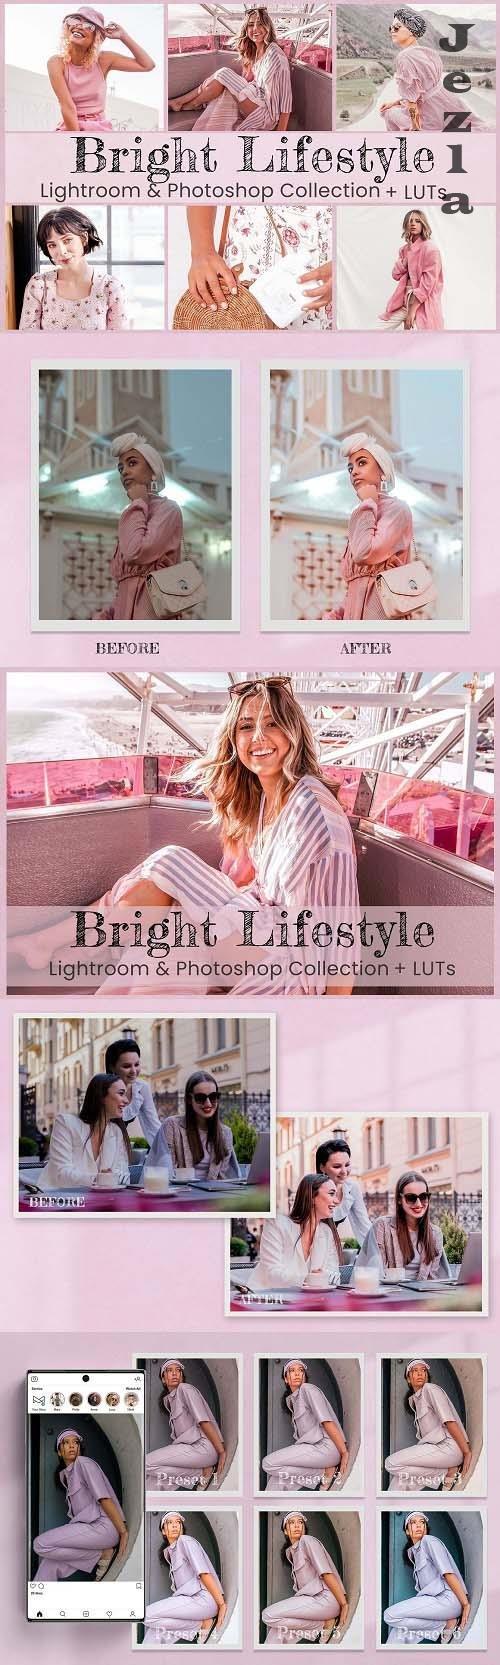 Bright Lifestyle Lightroom Photoshop - 6545738